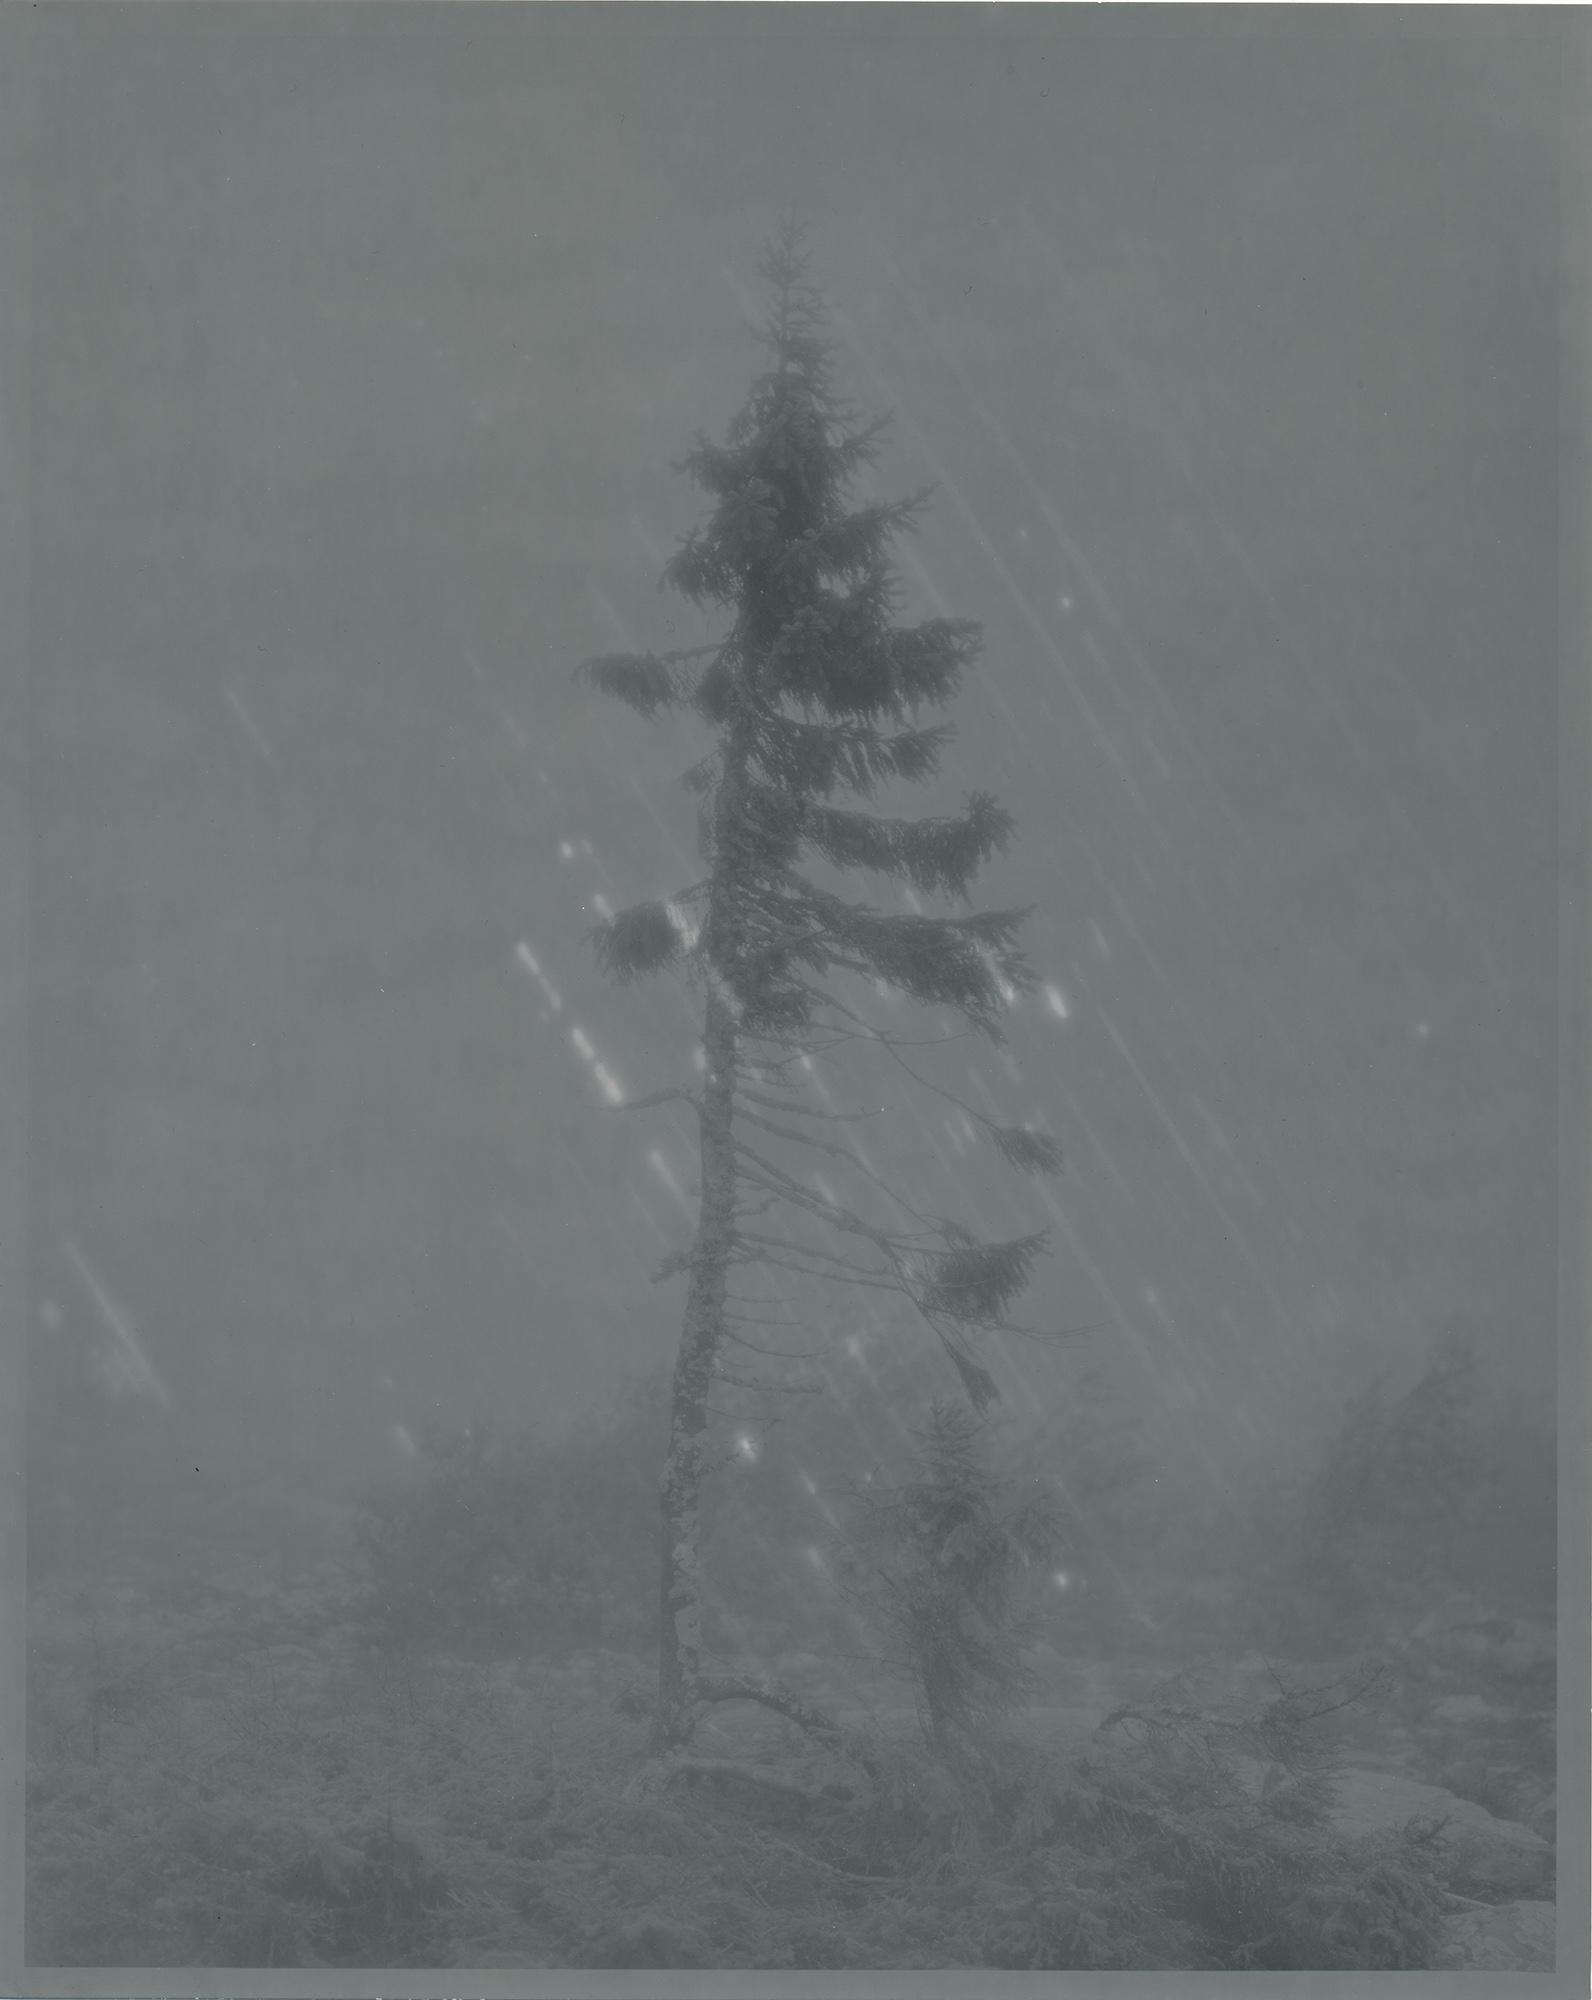 Fotó: Nicolai Howalt: Old Tjikko, Ilford Multigrade Velvet, lejárat: 1964. szeptember